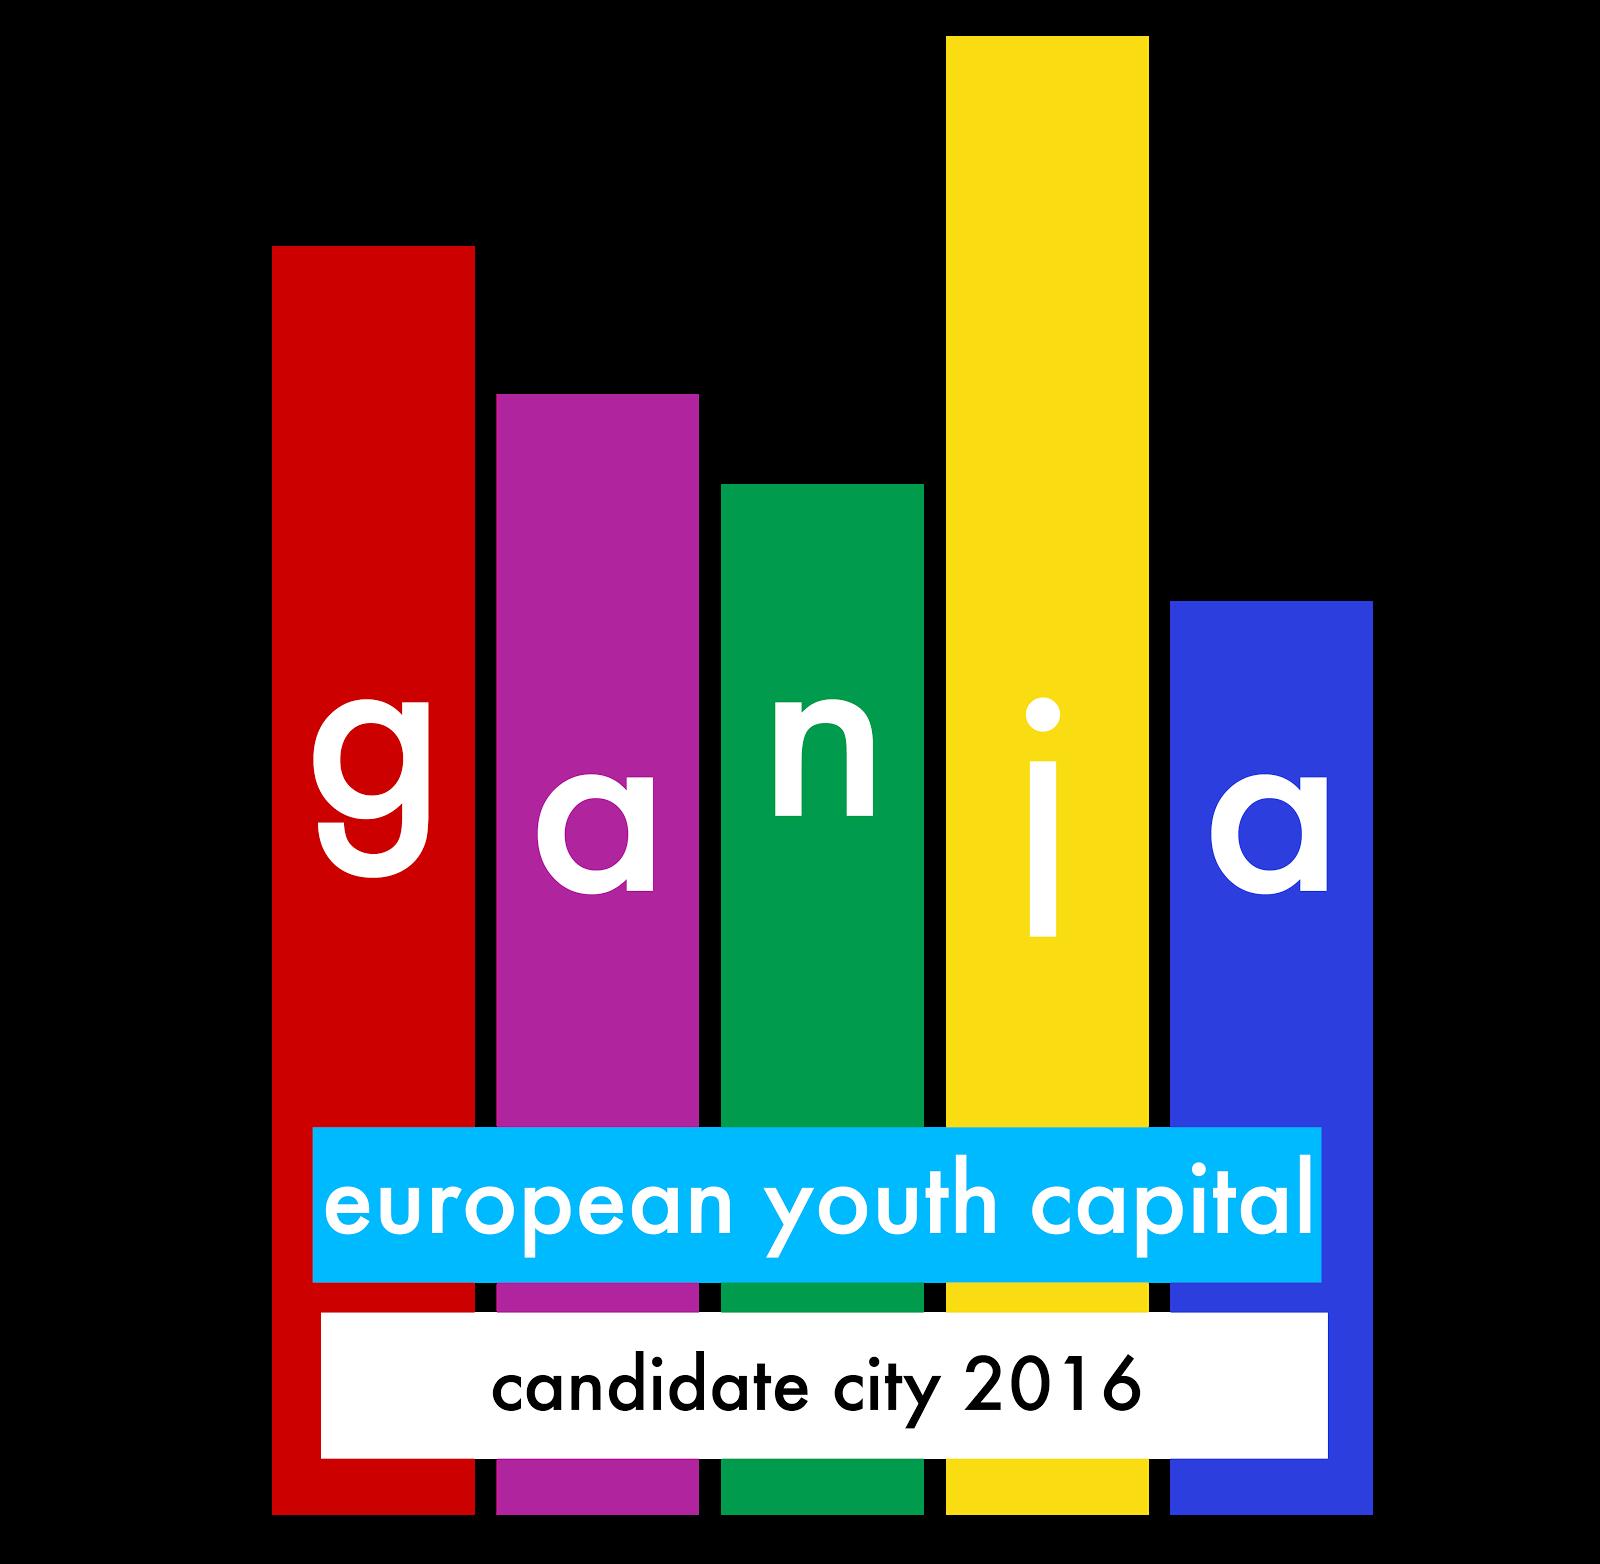 Ganja European Youth Capital 2016